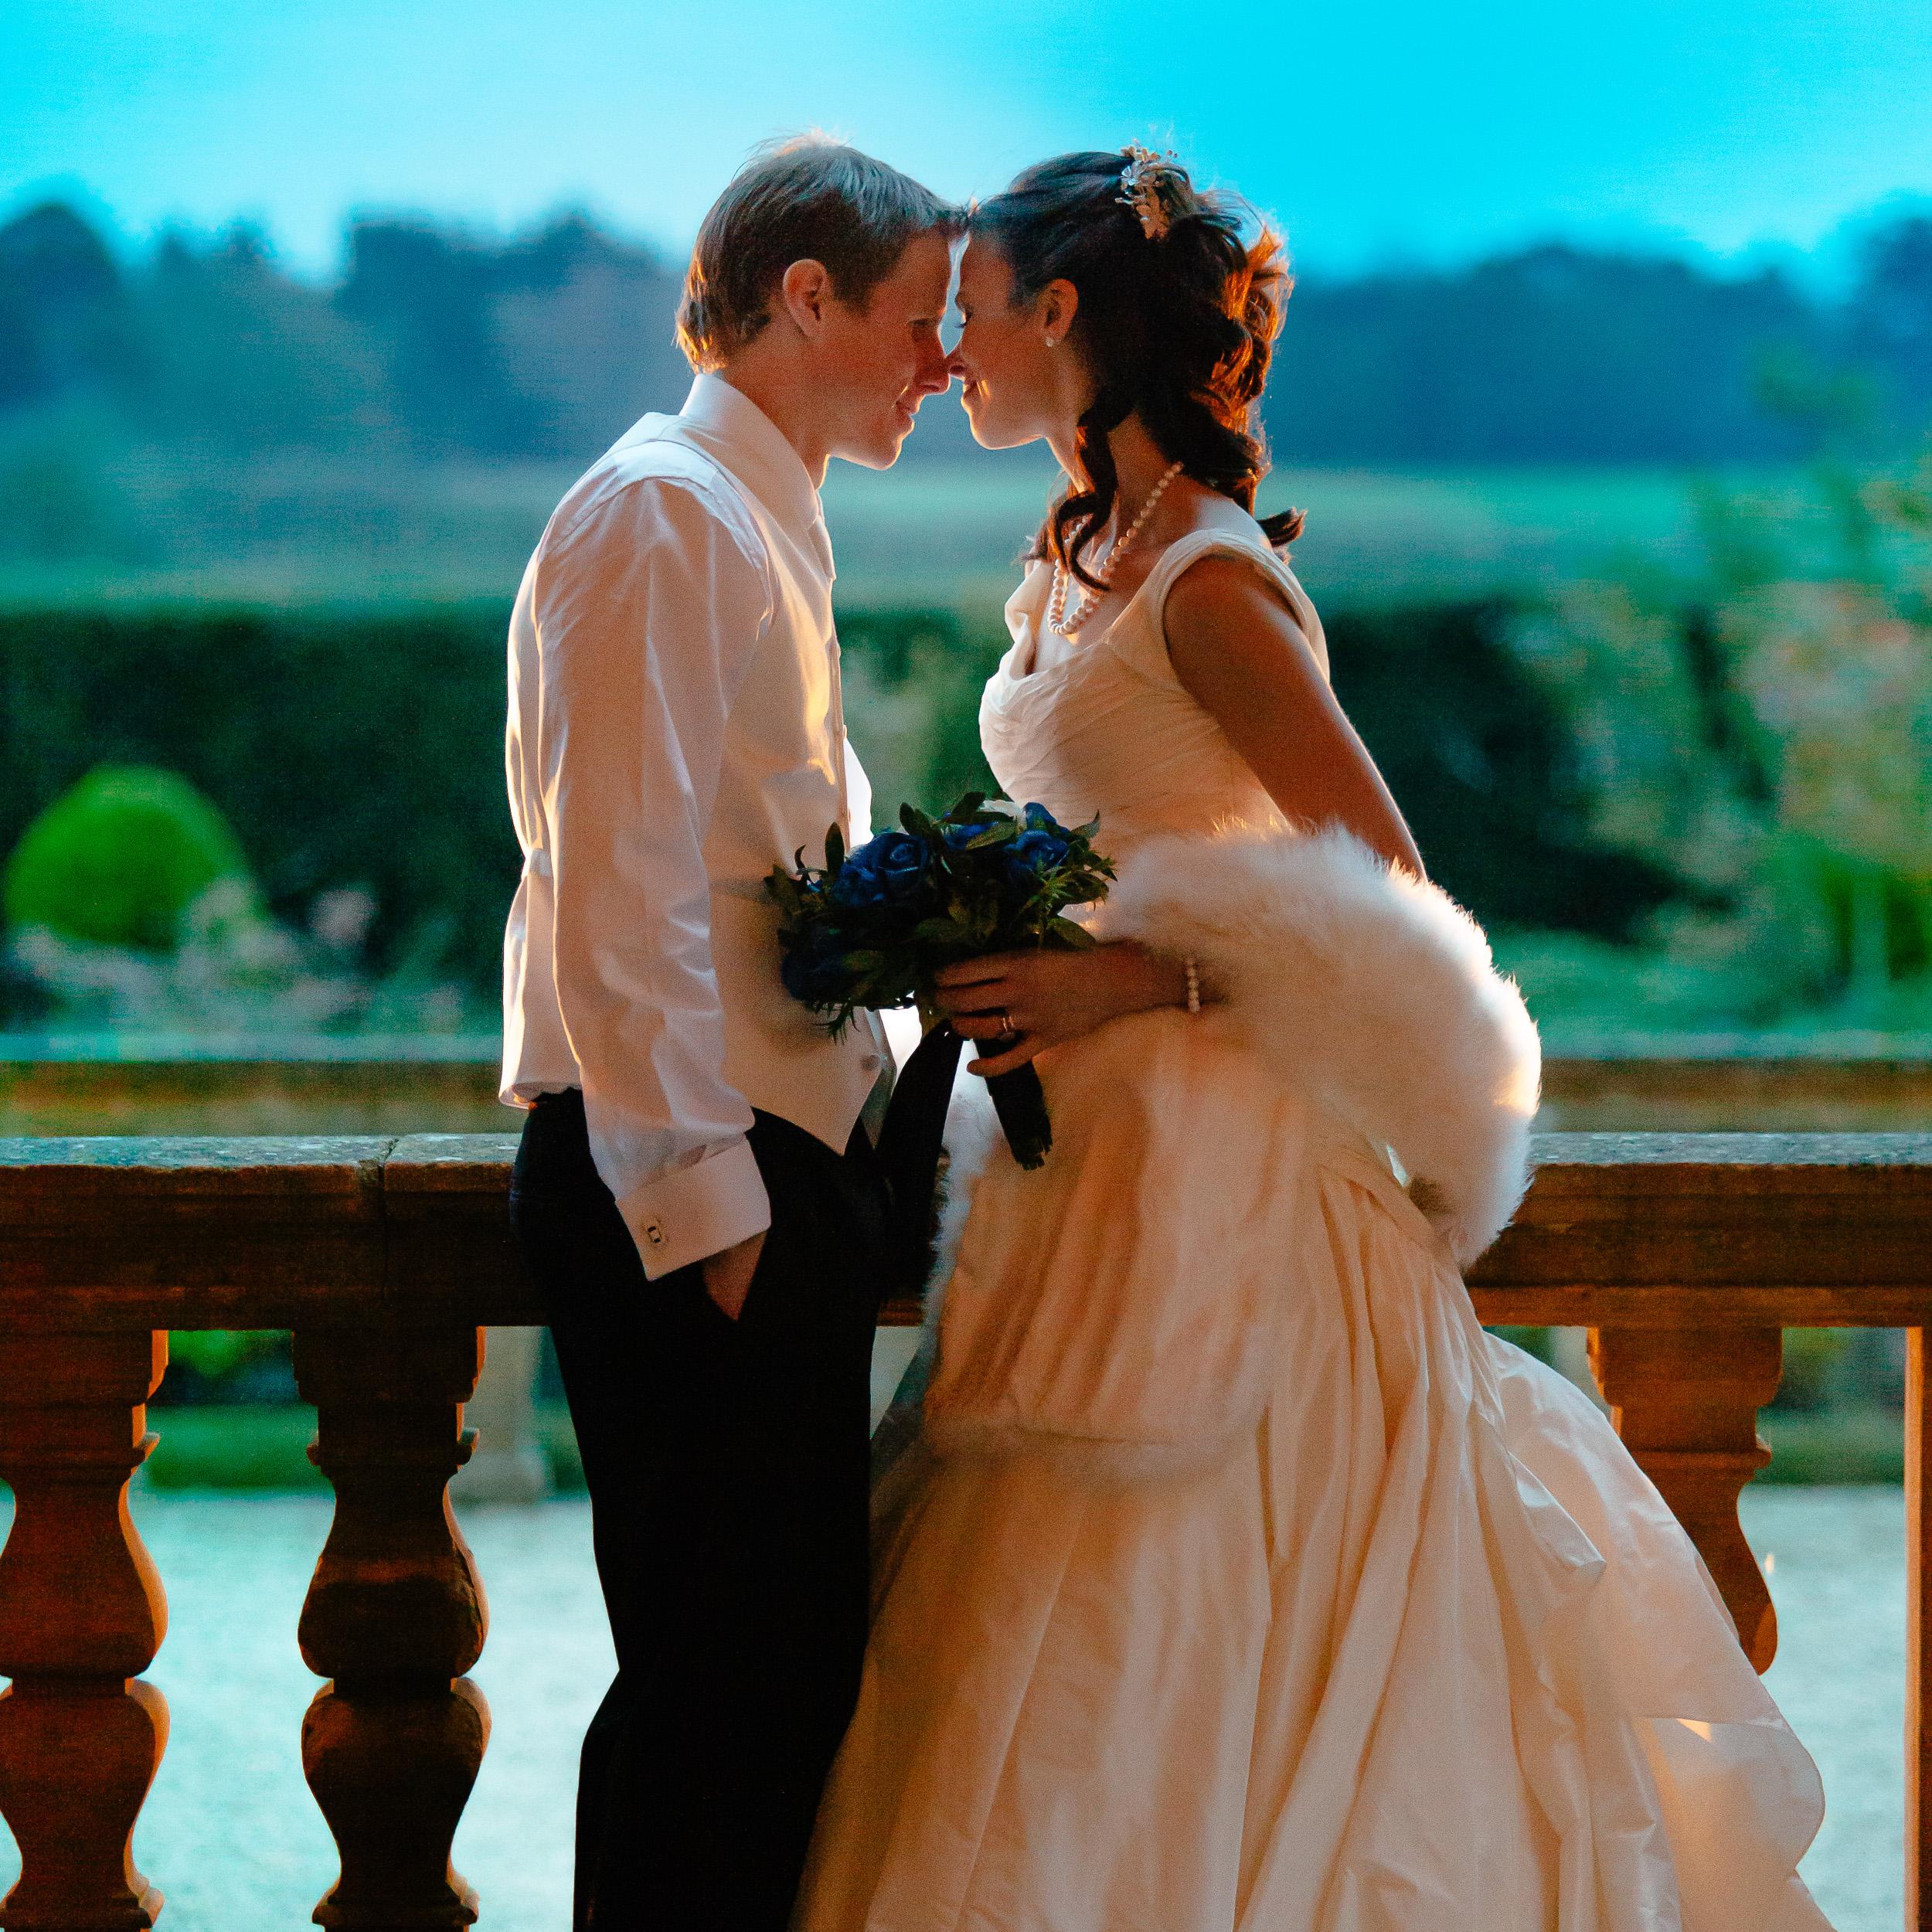 James & Catherine - Eynsham Hall // Abingdon Oxford